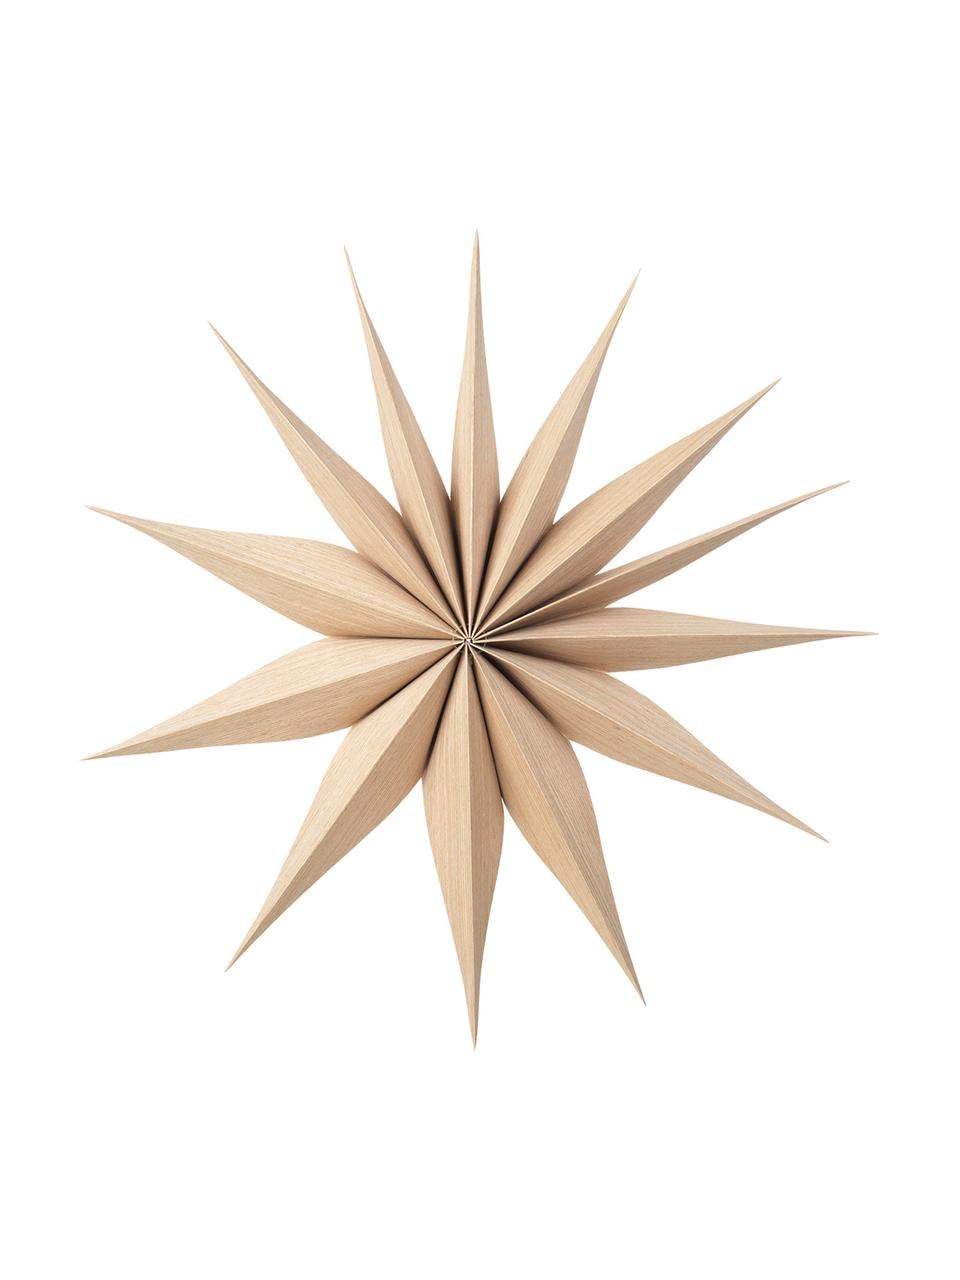 Deko-Sterne Venok, 2 Stück, Dünnes Holz, Hellbraun, Ø 40 cm